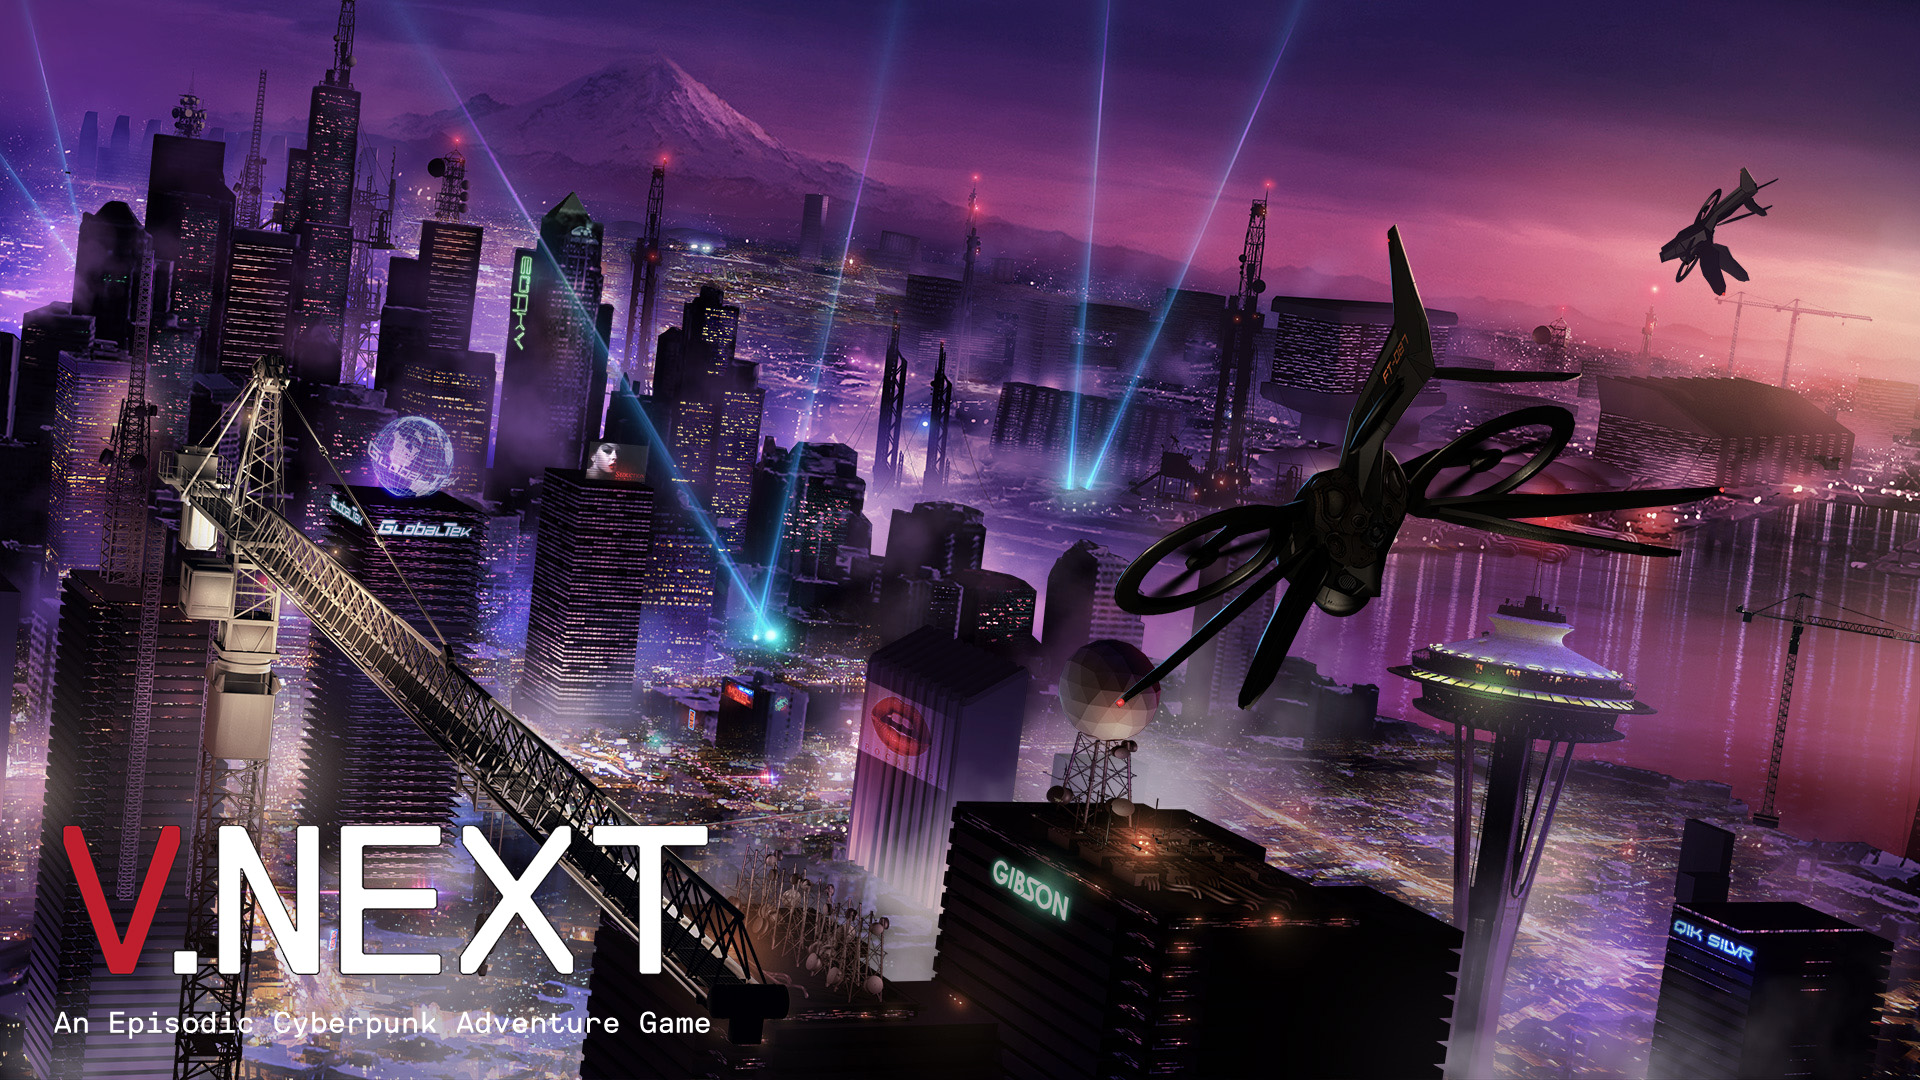 VNext An Episodic Cyberpunk Adventure